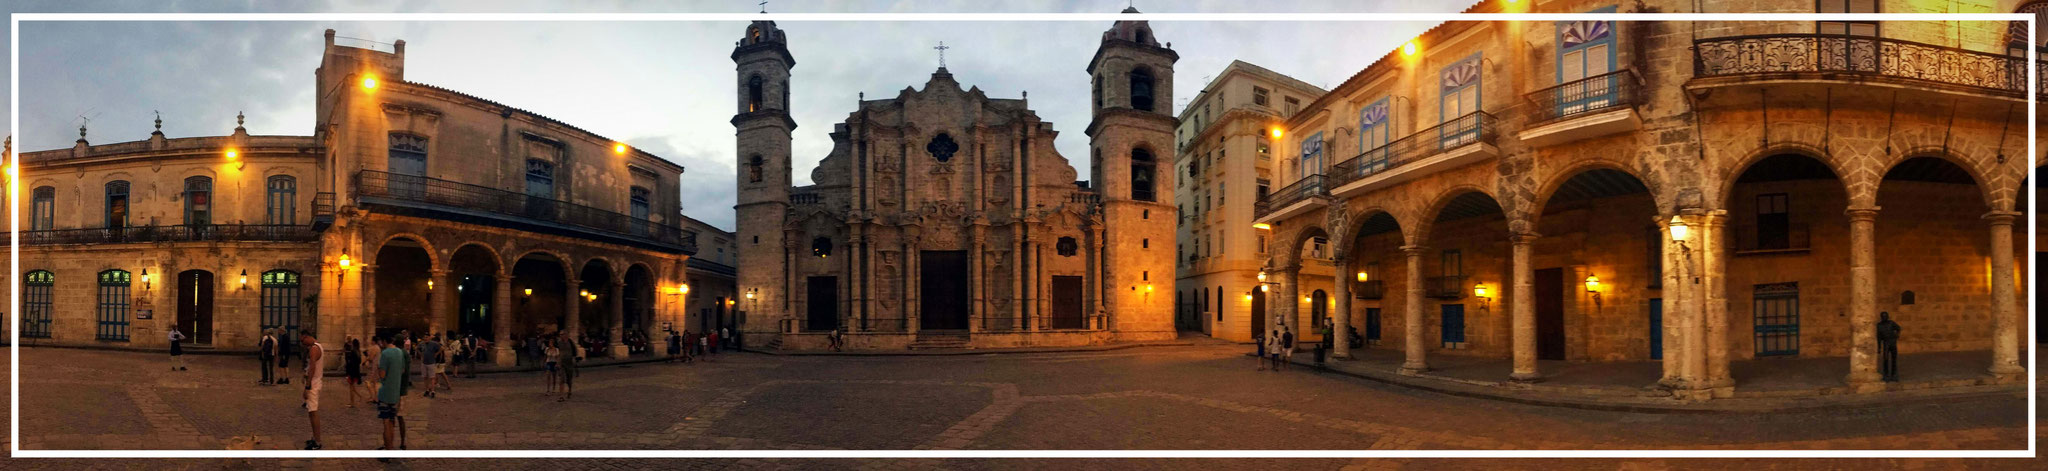 Plaza de la Catedral of Havana mit Catedral de la Habana